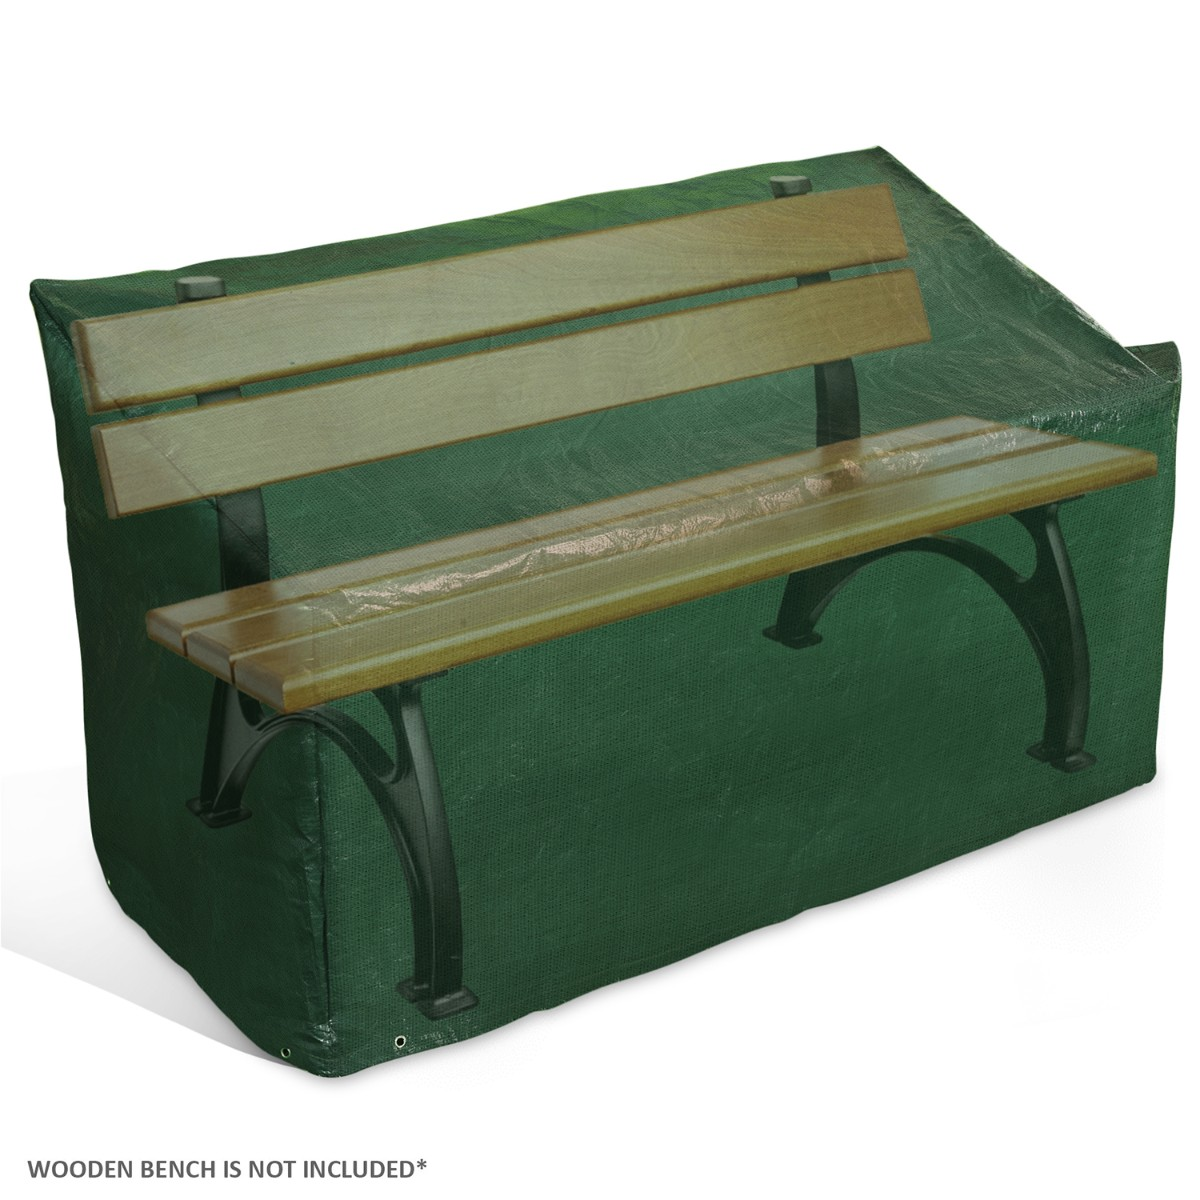 Peachy Details About Heavy Duty Garden 3 Seater Bench Seat Cover Waterproof Weatherproof Outdoor 5Ft Customarchery Wood Chair Design Ideas Customarcherynet